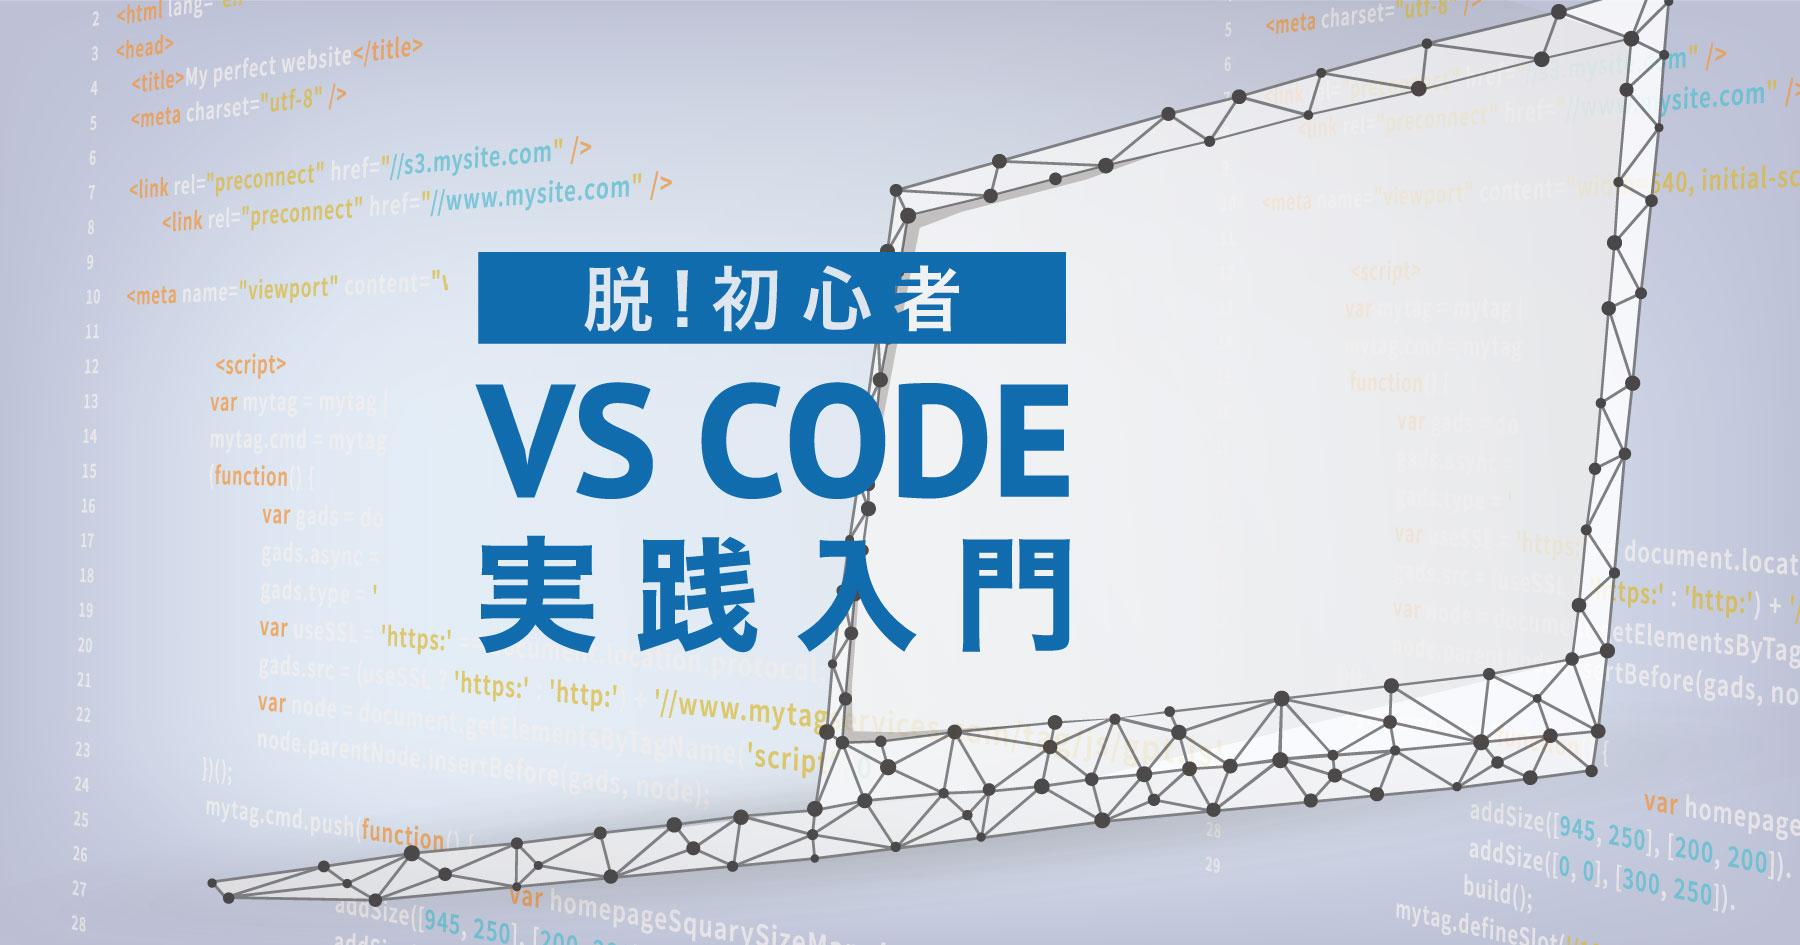 Visual Studio Codeのうれしい機能を使いこなして、初心者を最速で脱出する!《VSCode実践入門》